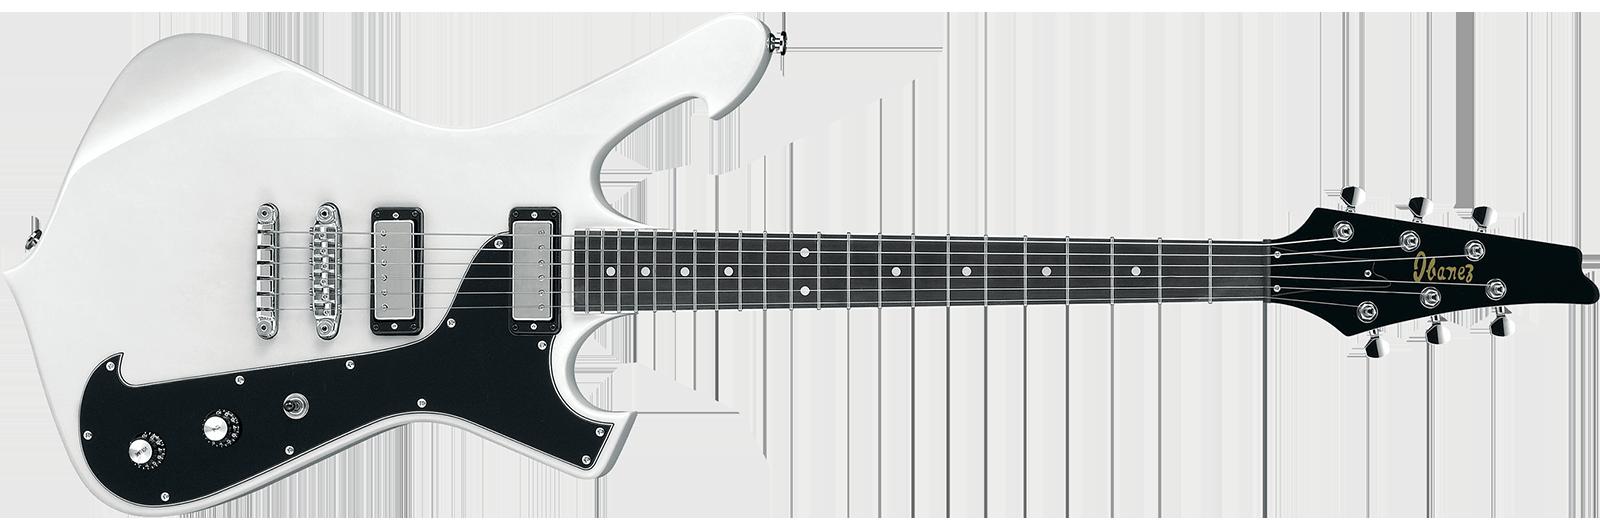 Paul Gilbert Signature Guitar